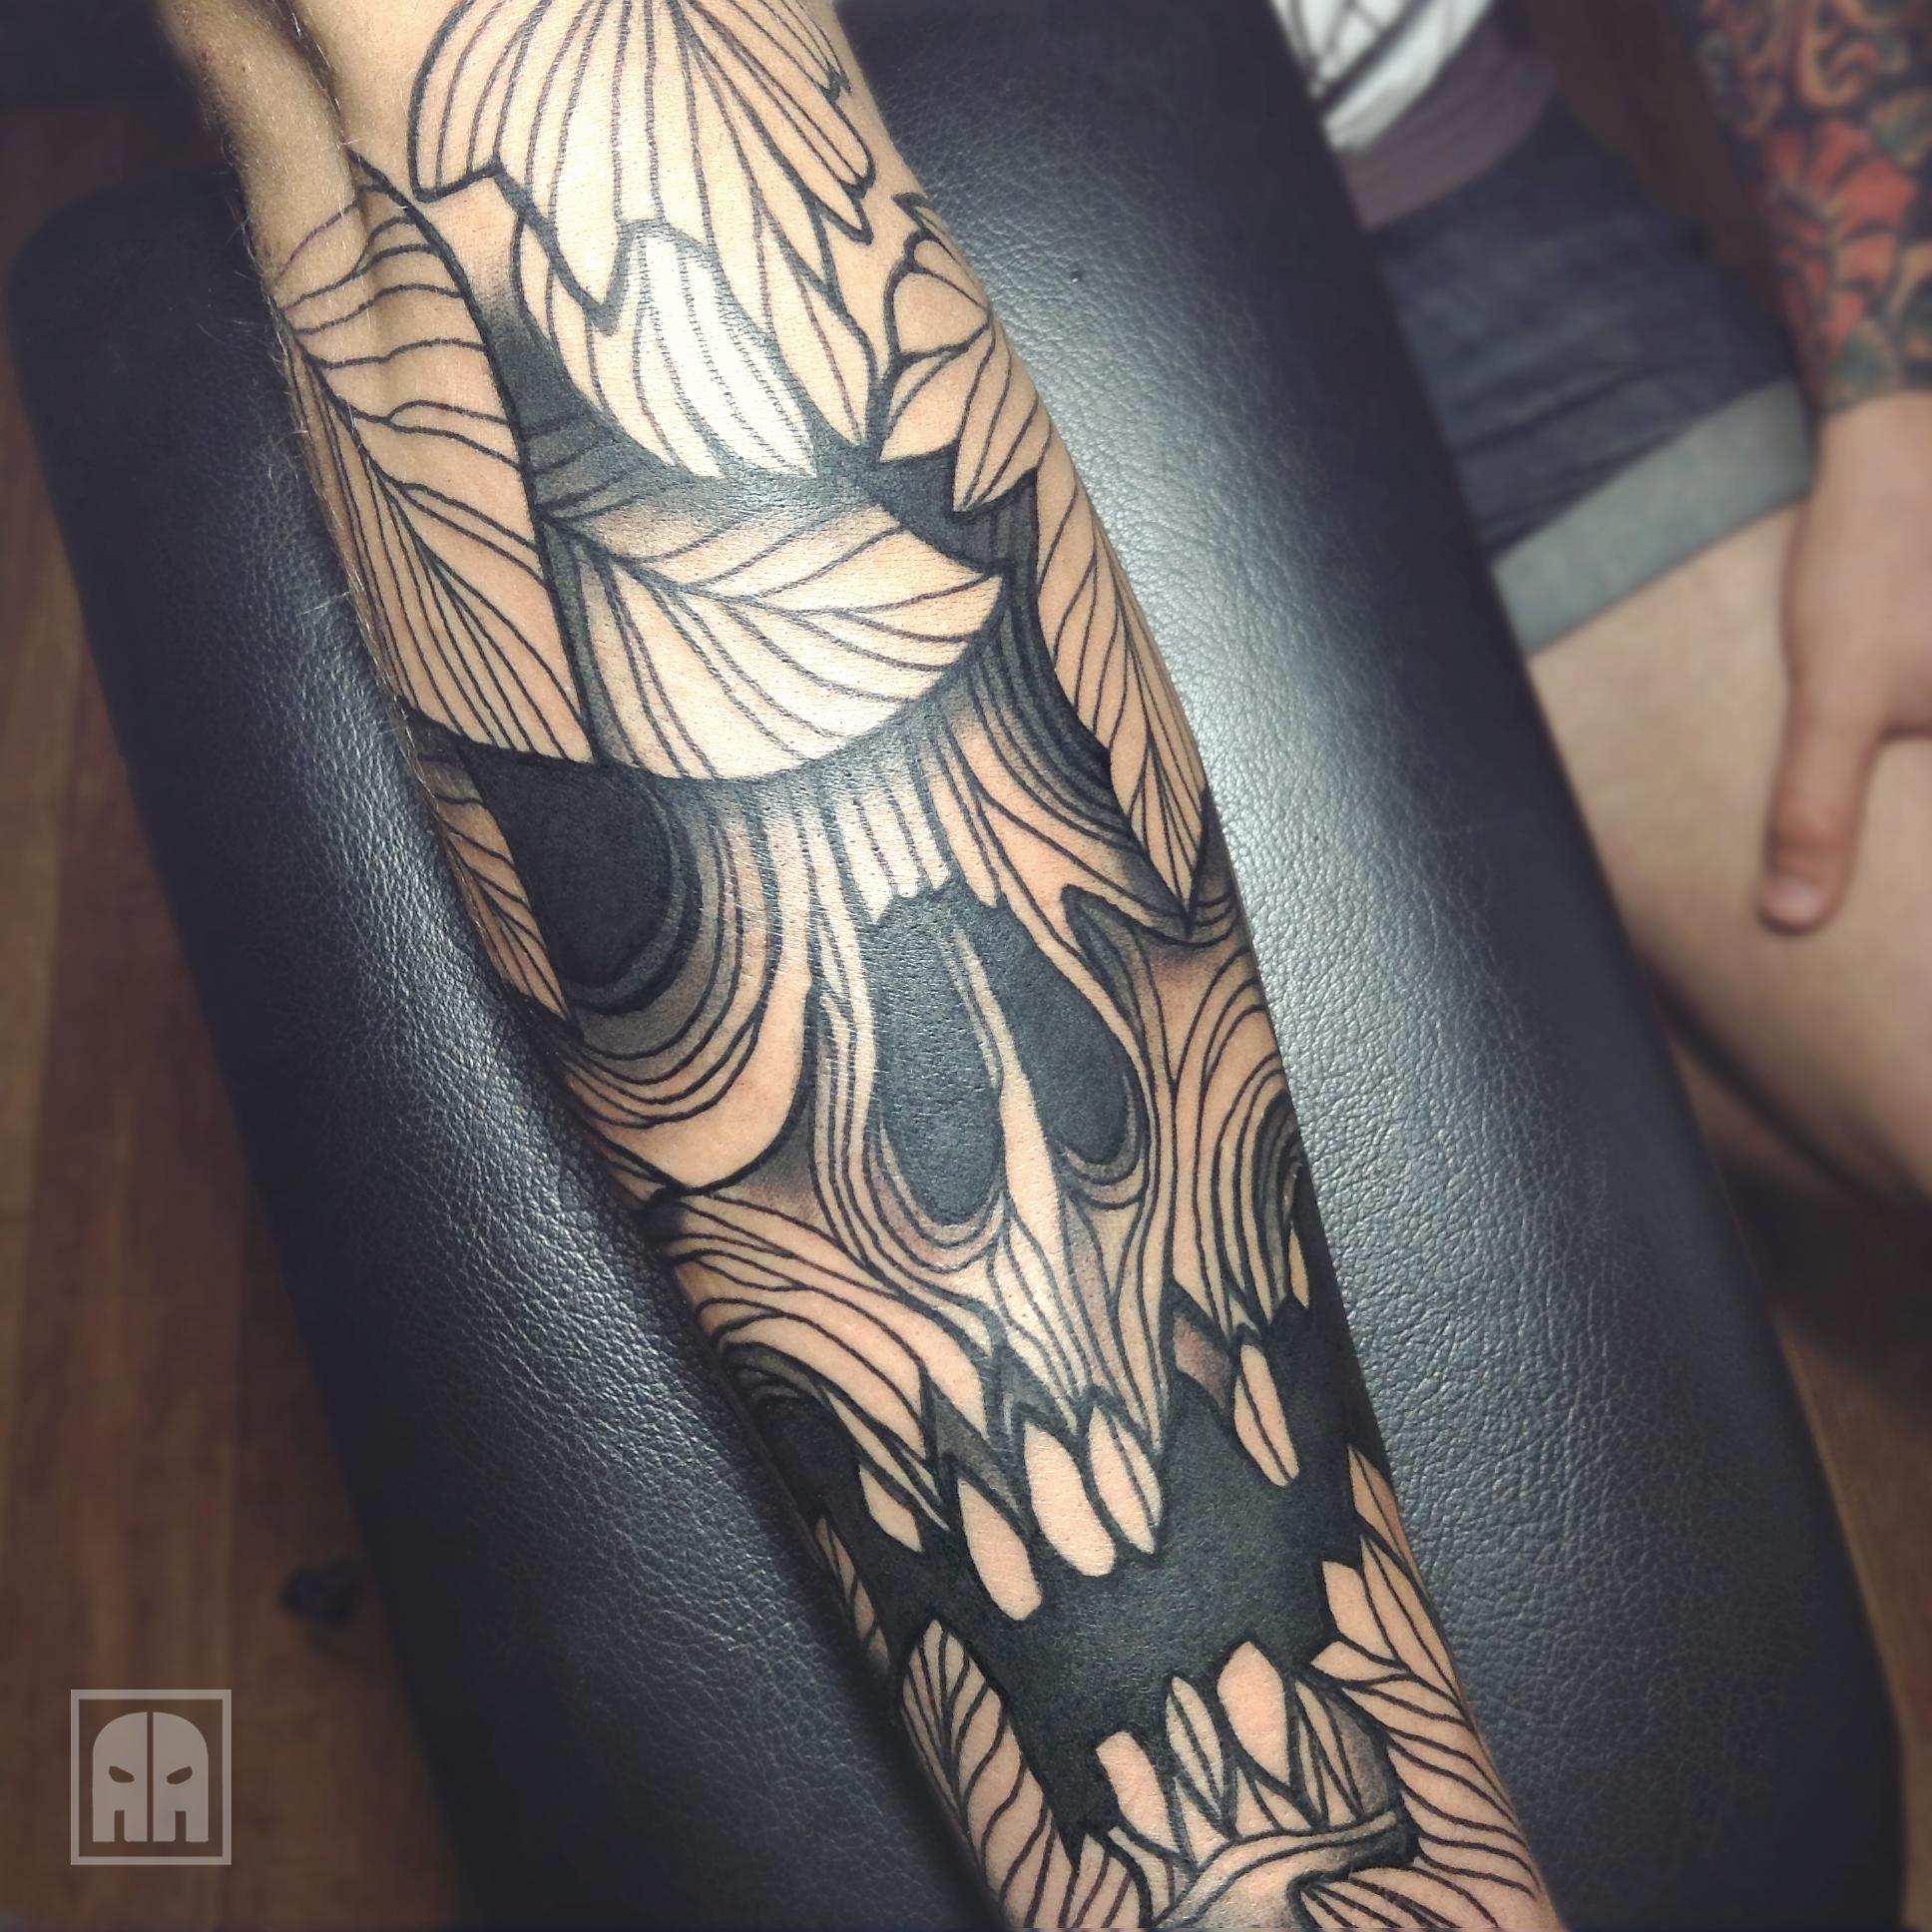 #skull #stroke #sevastopol #sevastopoltattoo #style #bone #tattoo #tattooinukraine #traditionaltattoo #ebonytattoo #neotradtattoo  #inkartist